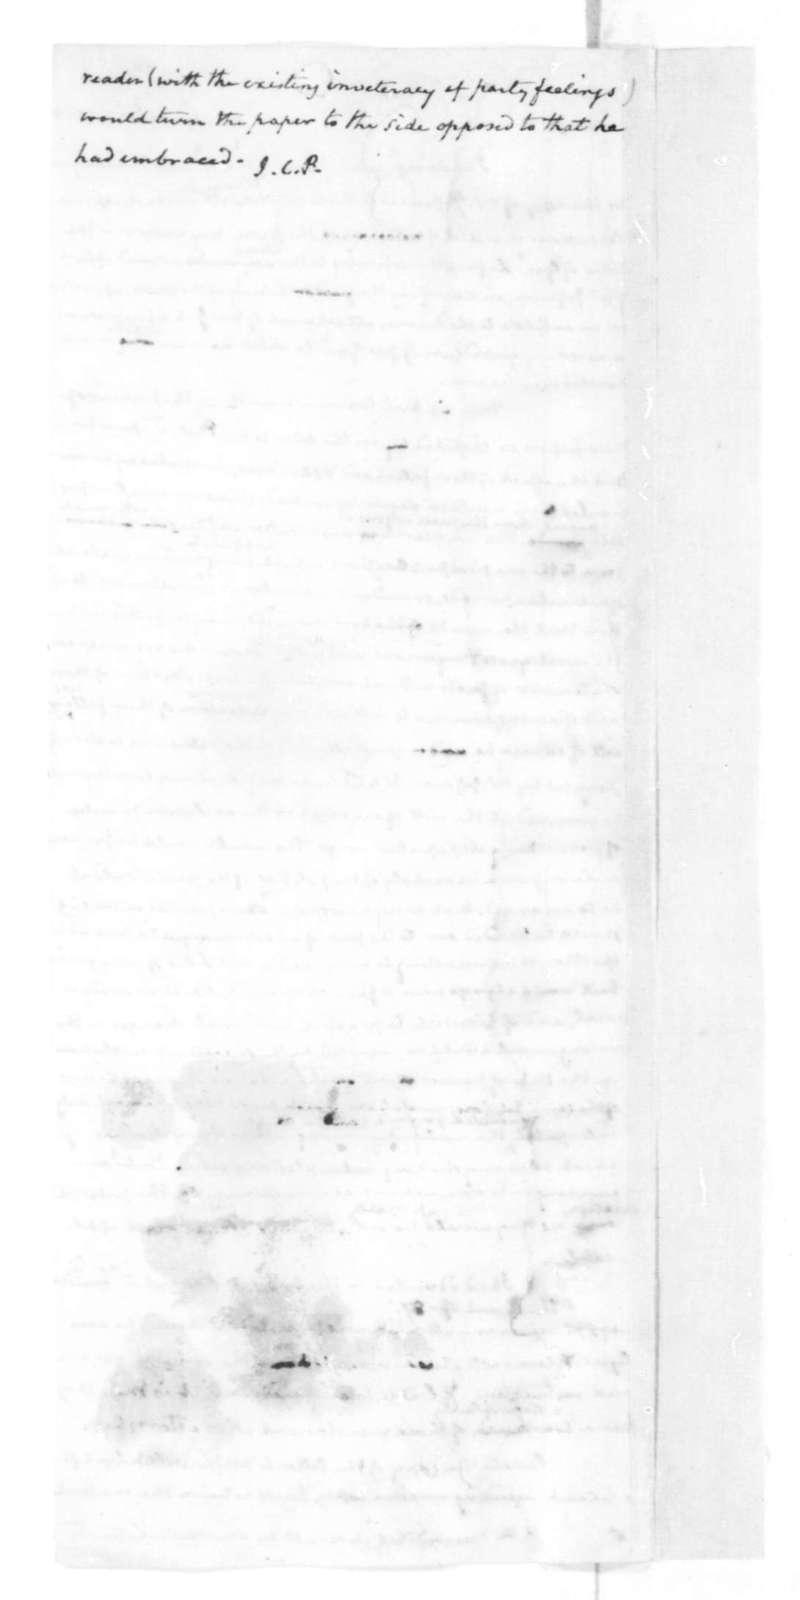 James Madison to Nicholas P. Trist, April 23, 1828.